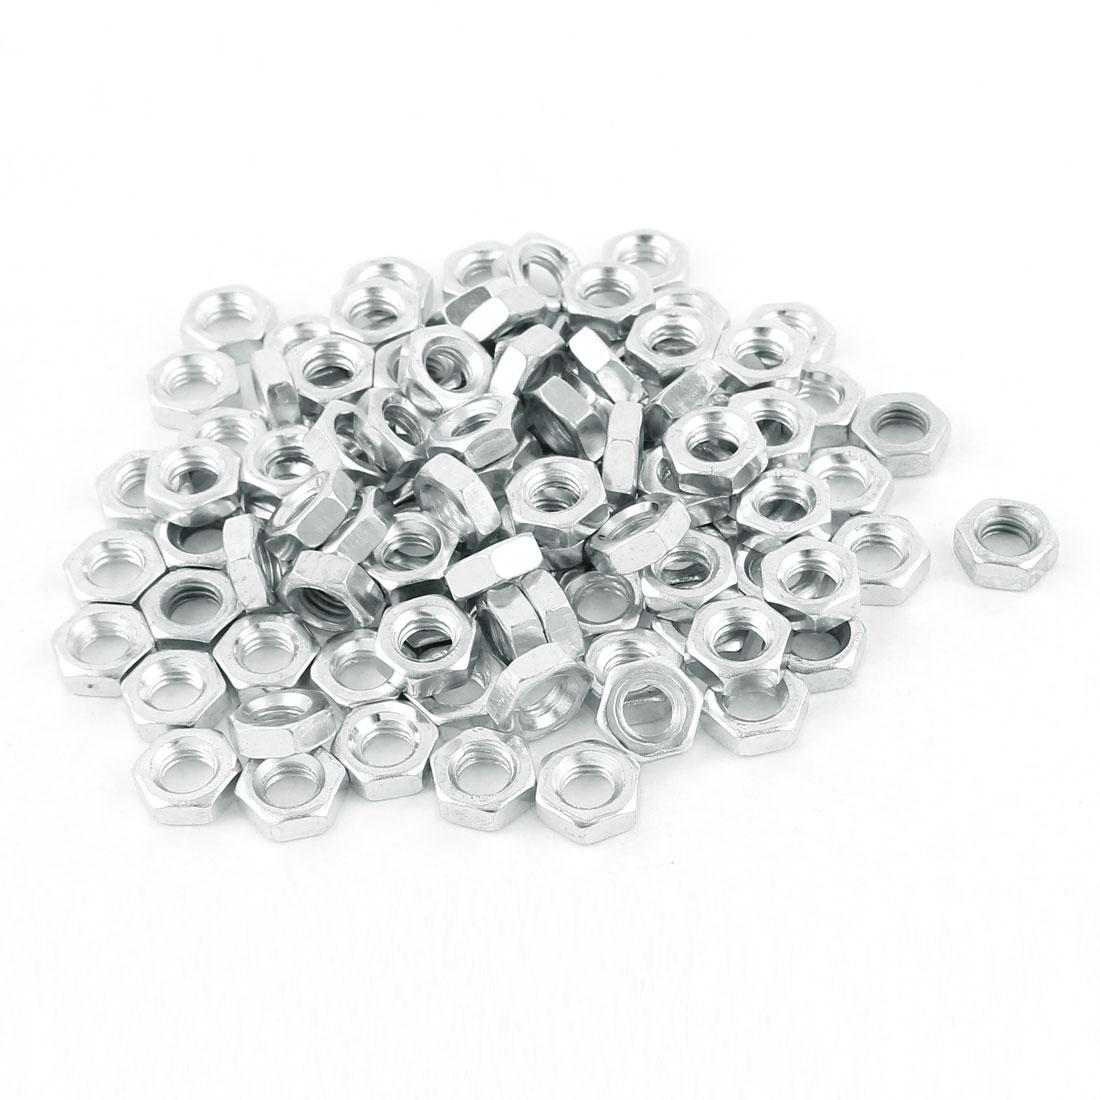 M6 Thread Dia 304 Stainless Steel Metric Hex Nut Screw Cap Fastener Silver Tone 100pcs